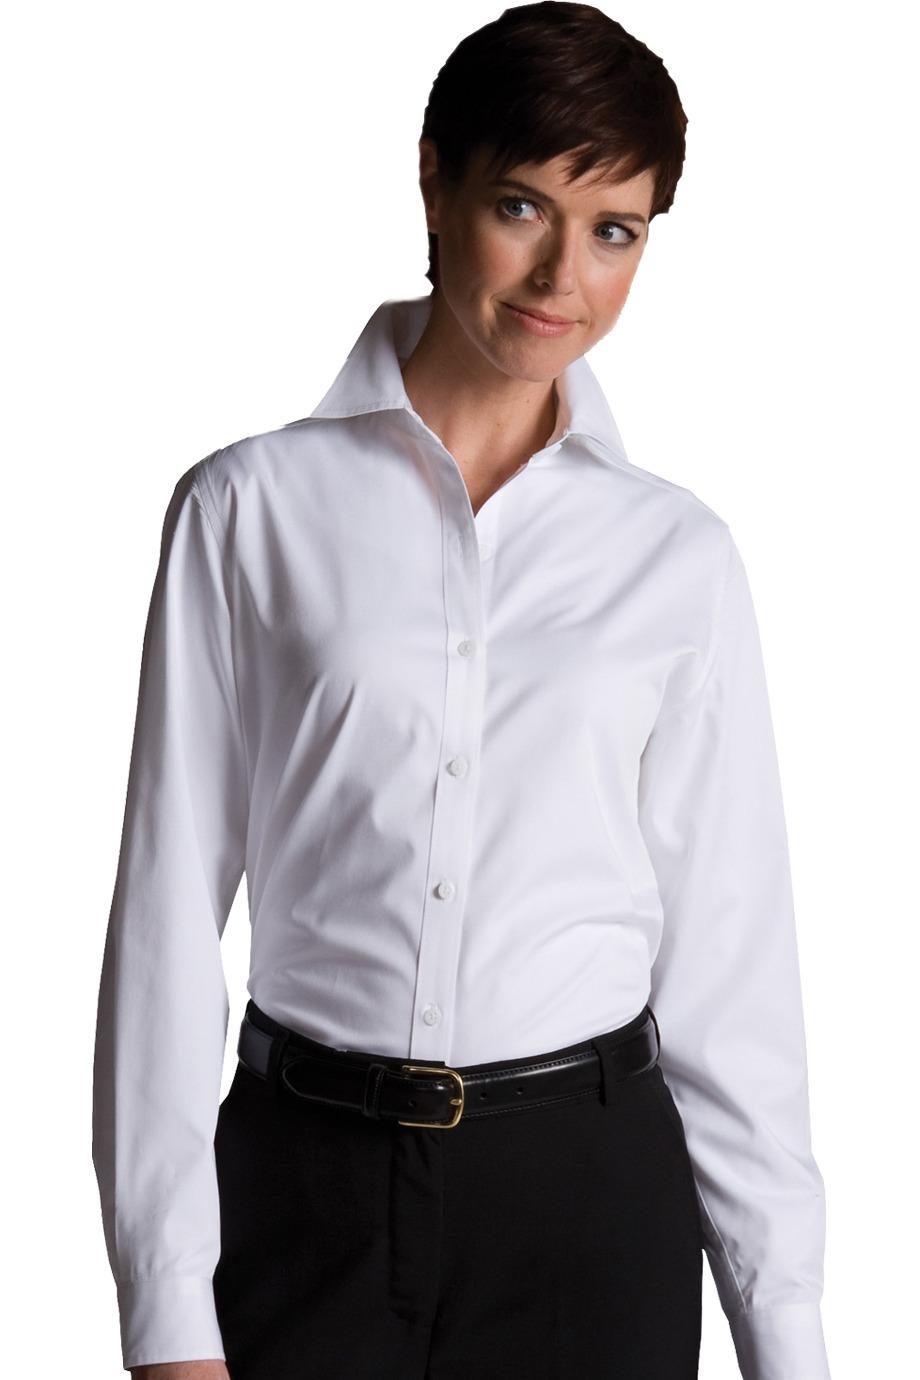 Edwards Garment 5750 - Women's Cottonplus Long Sleeve Twill Shirt